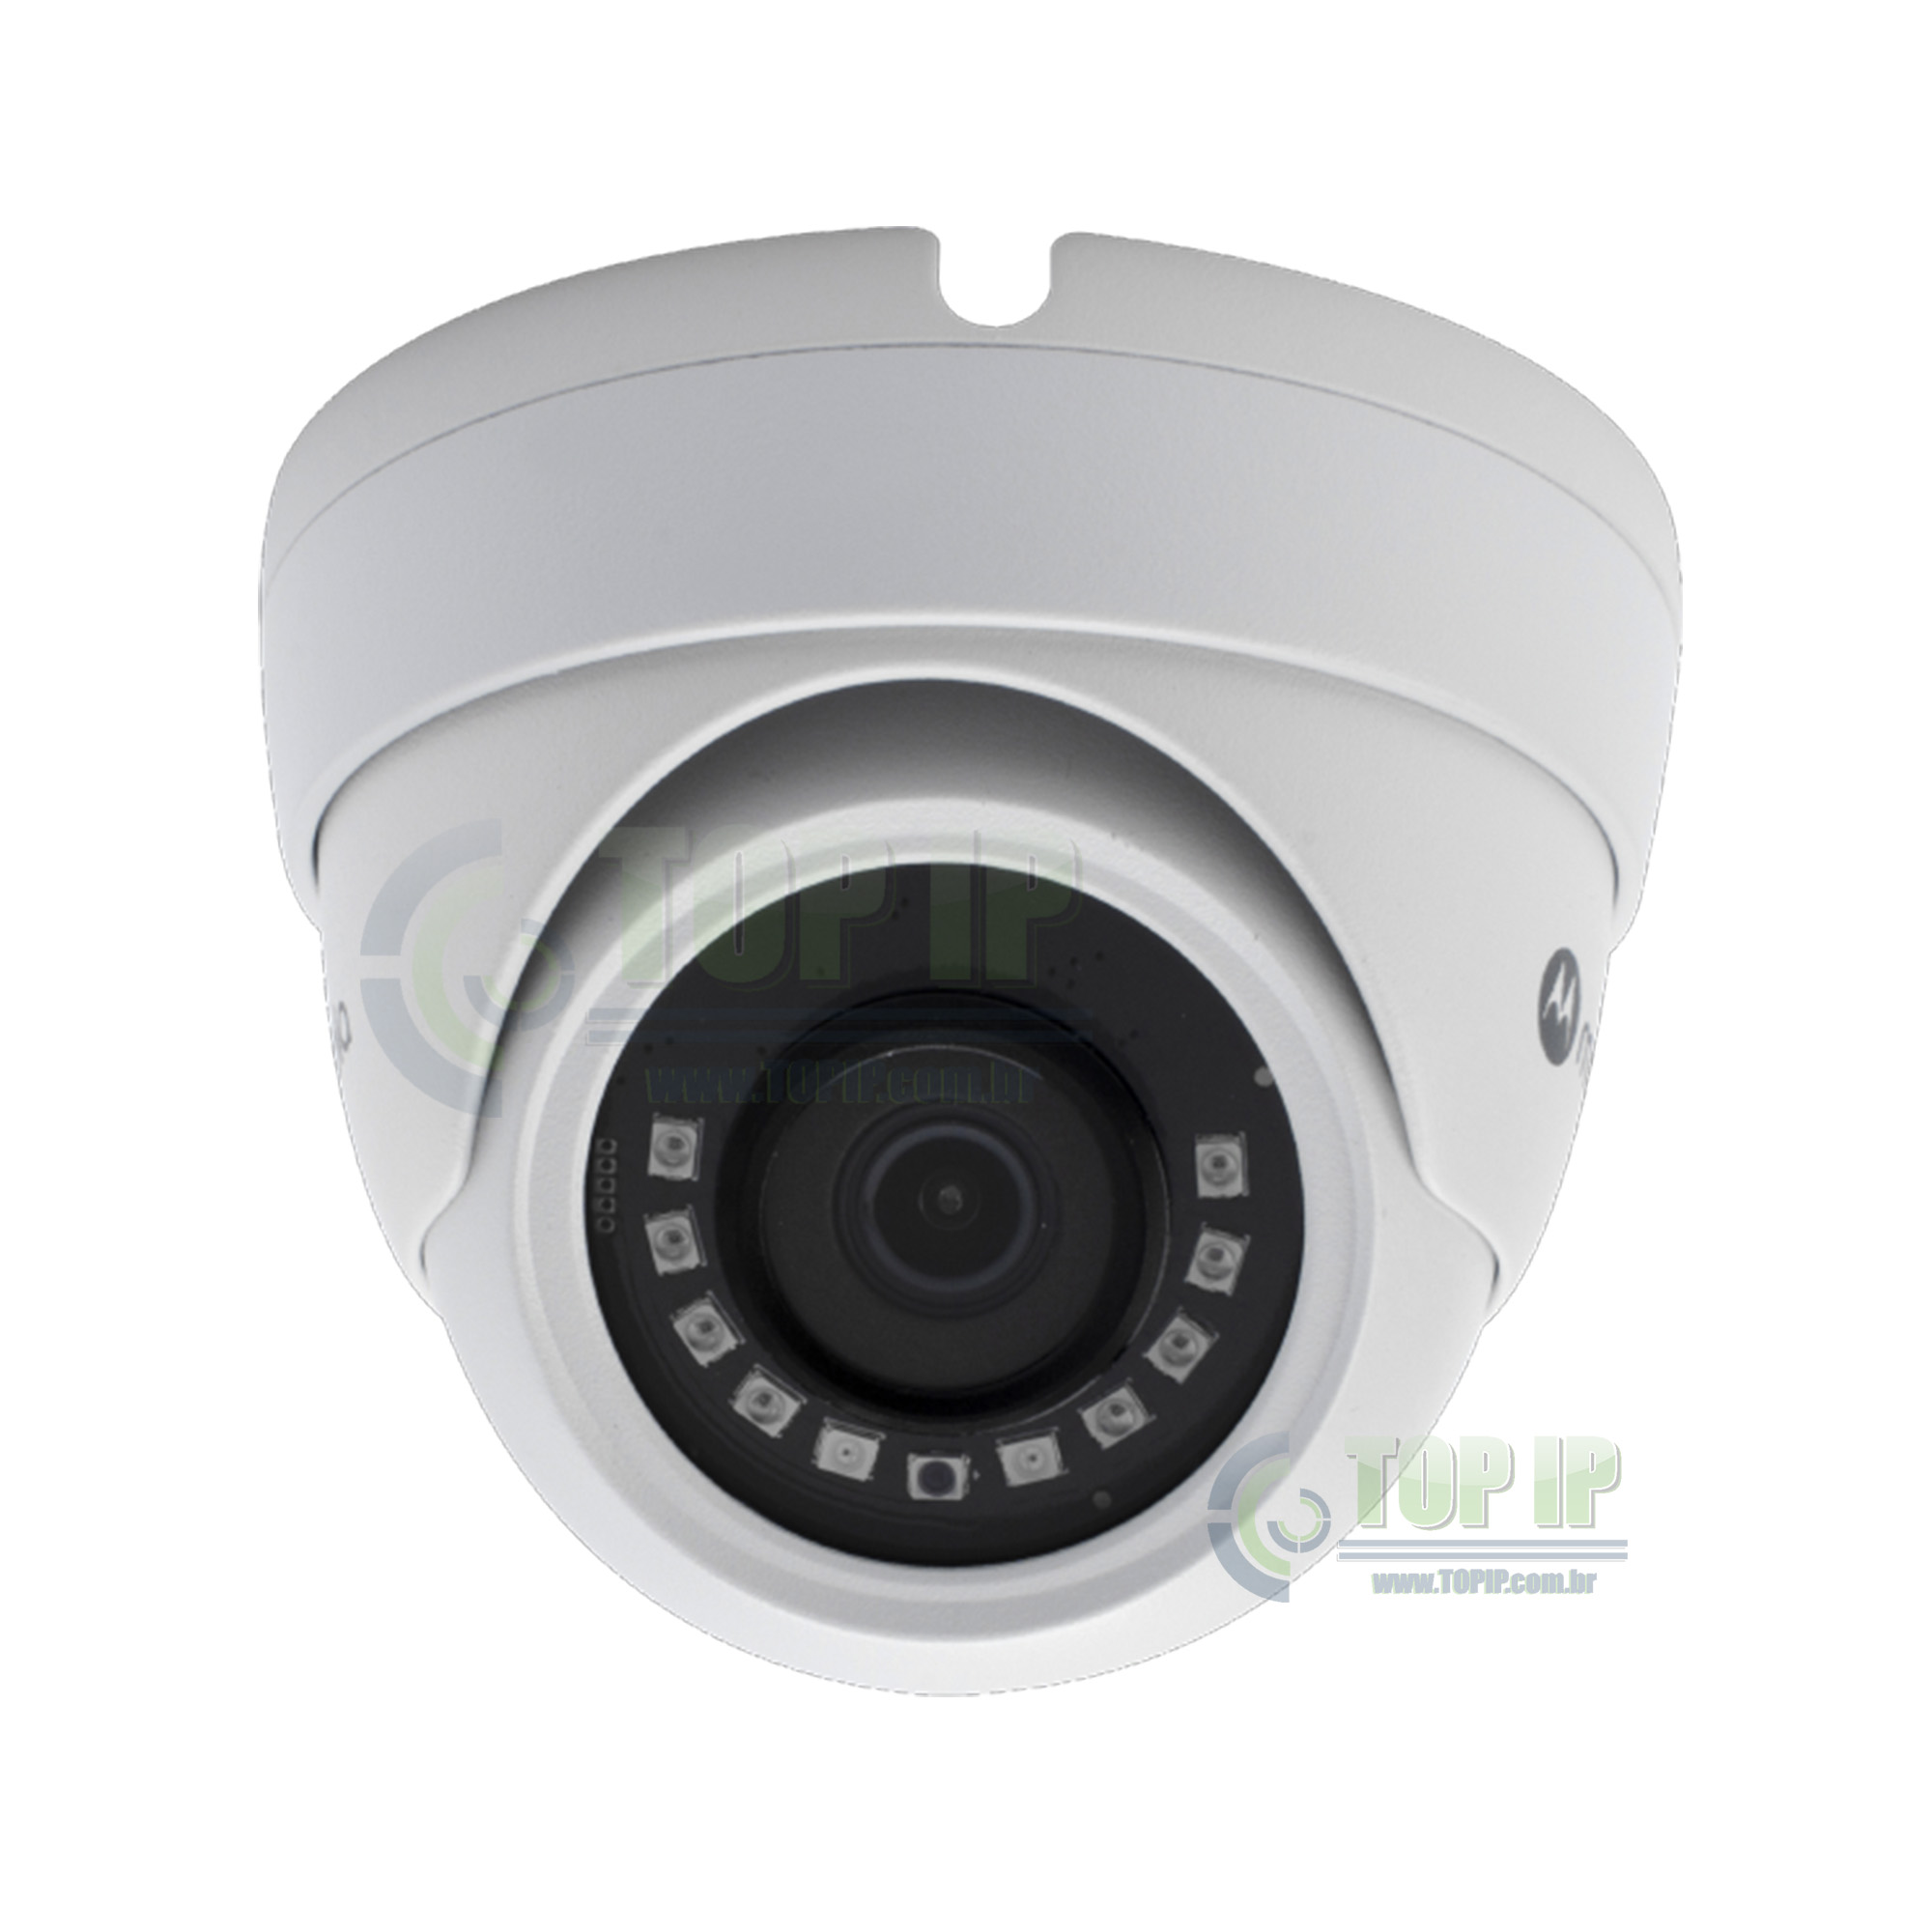 CAMERA DOME 1080P 2.8MM 20M 4X1 MOTOROLA MTADP022601